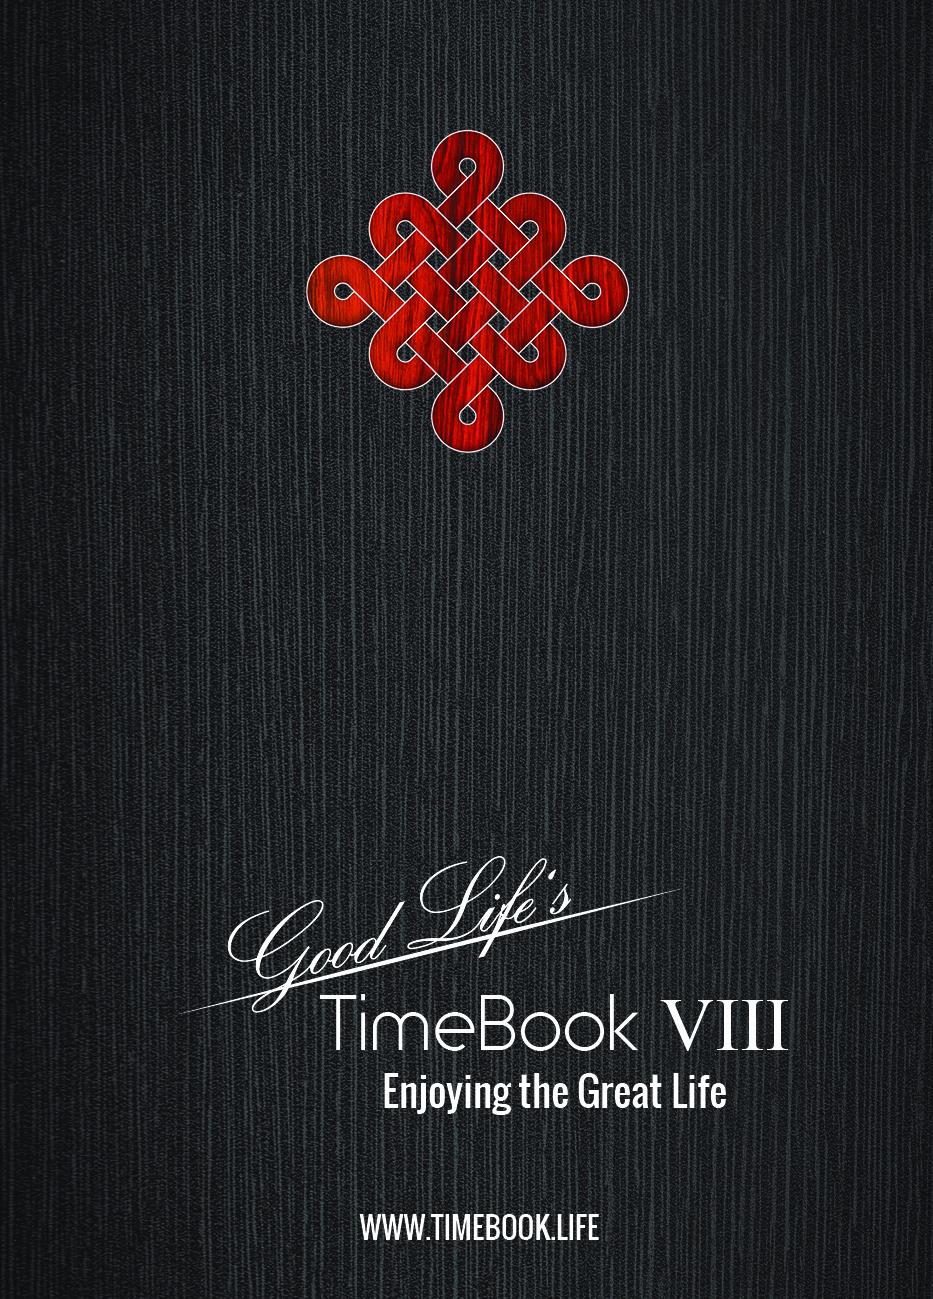 !KICKSTART! TimeBook VIII - Enjoying the Great Life